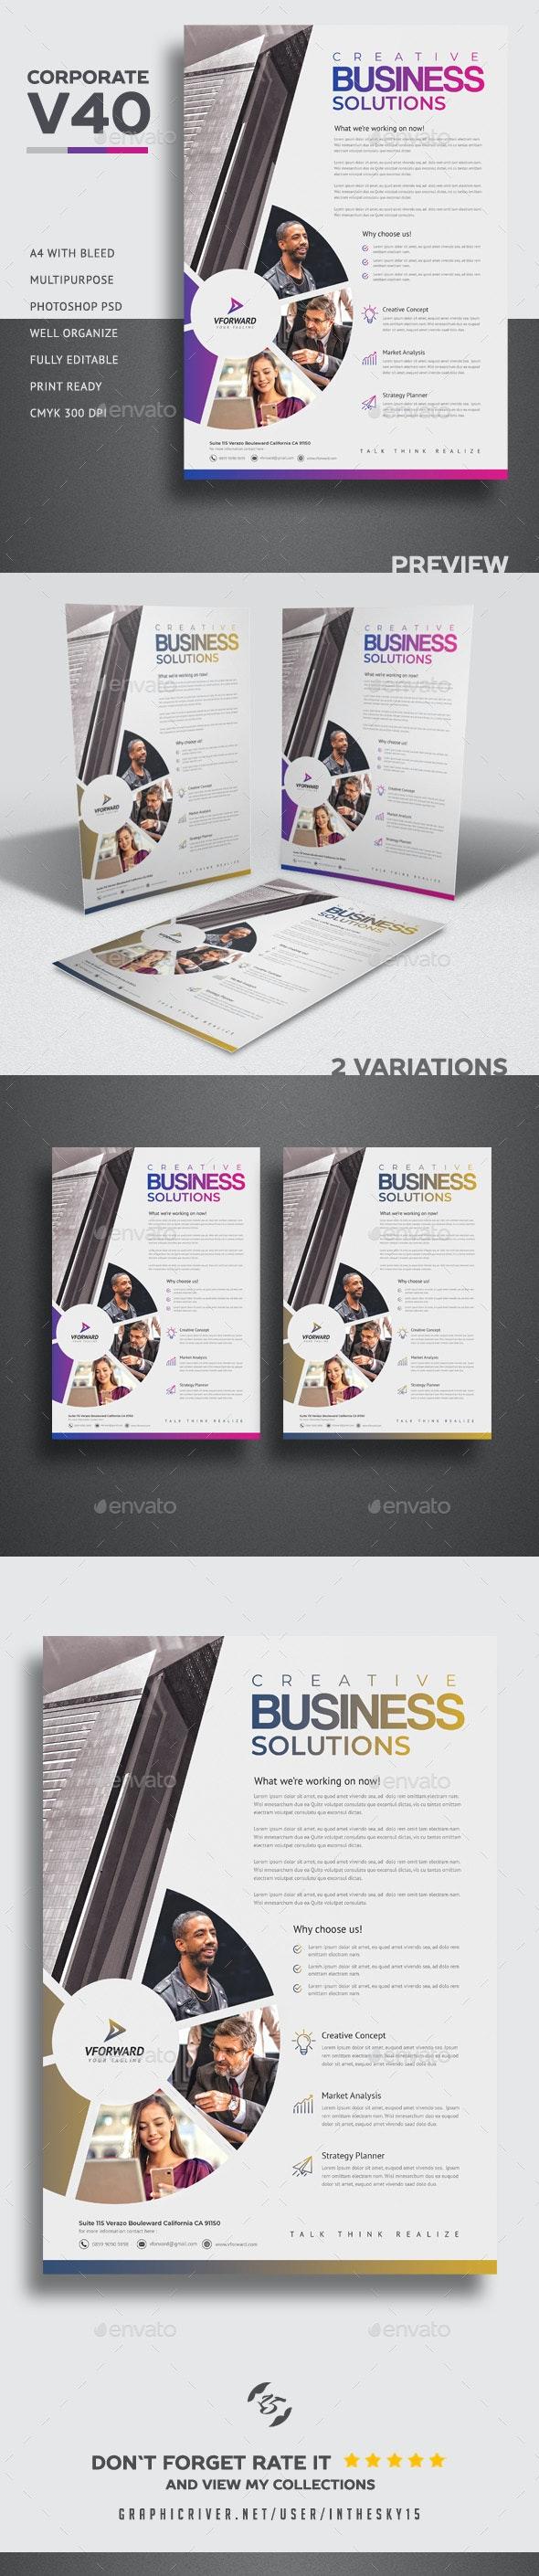 Corporate V40 Flyer - Flyers Print Templates